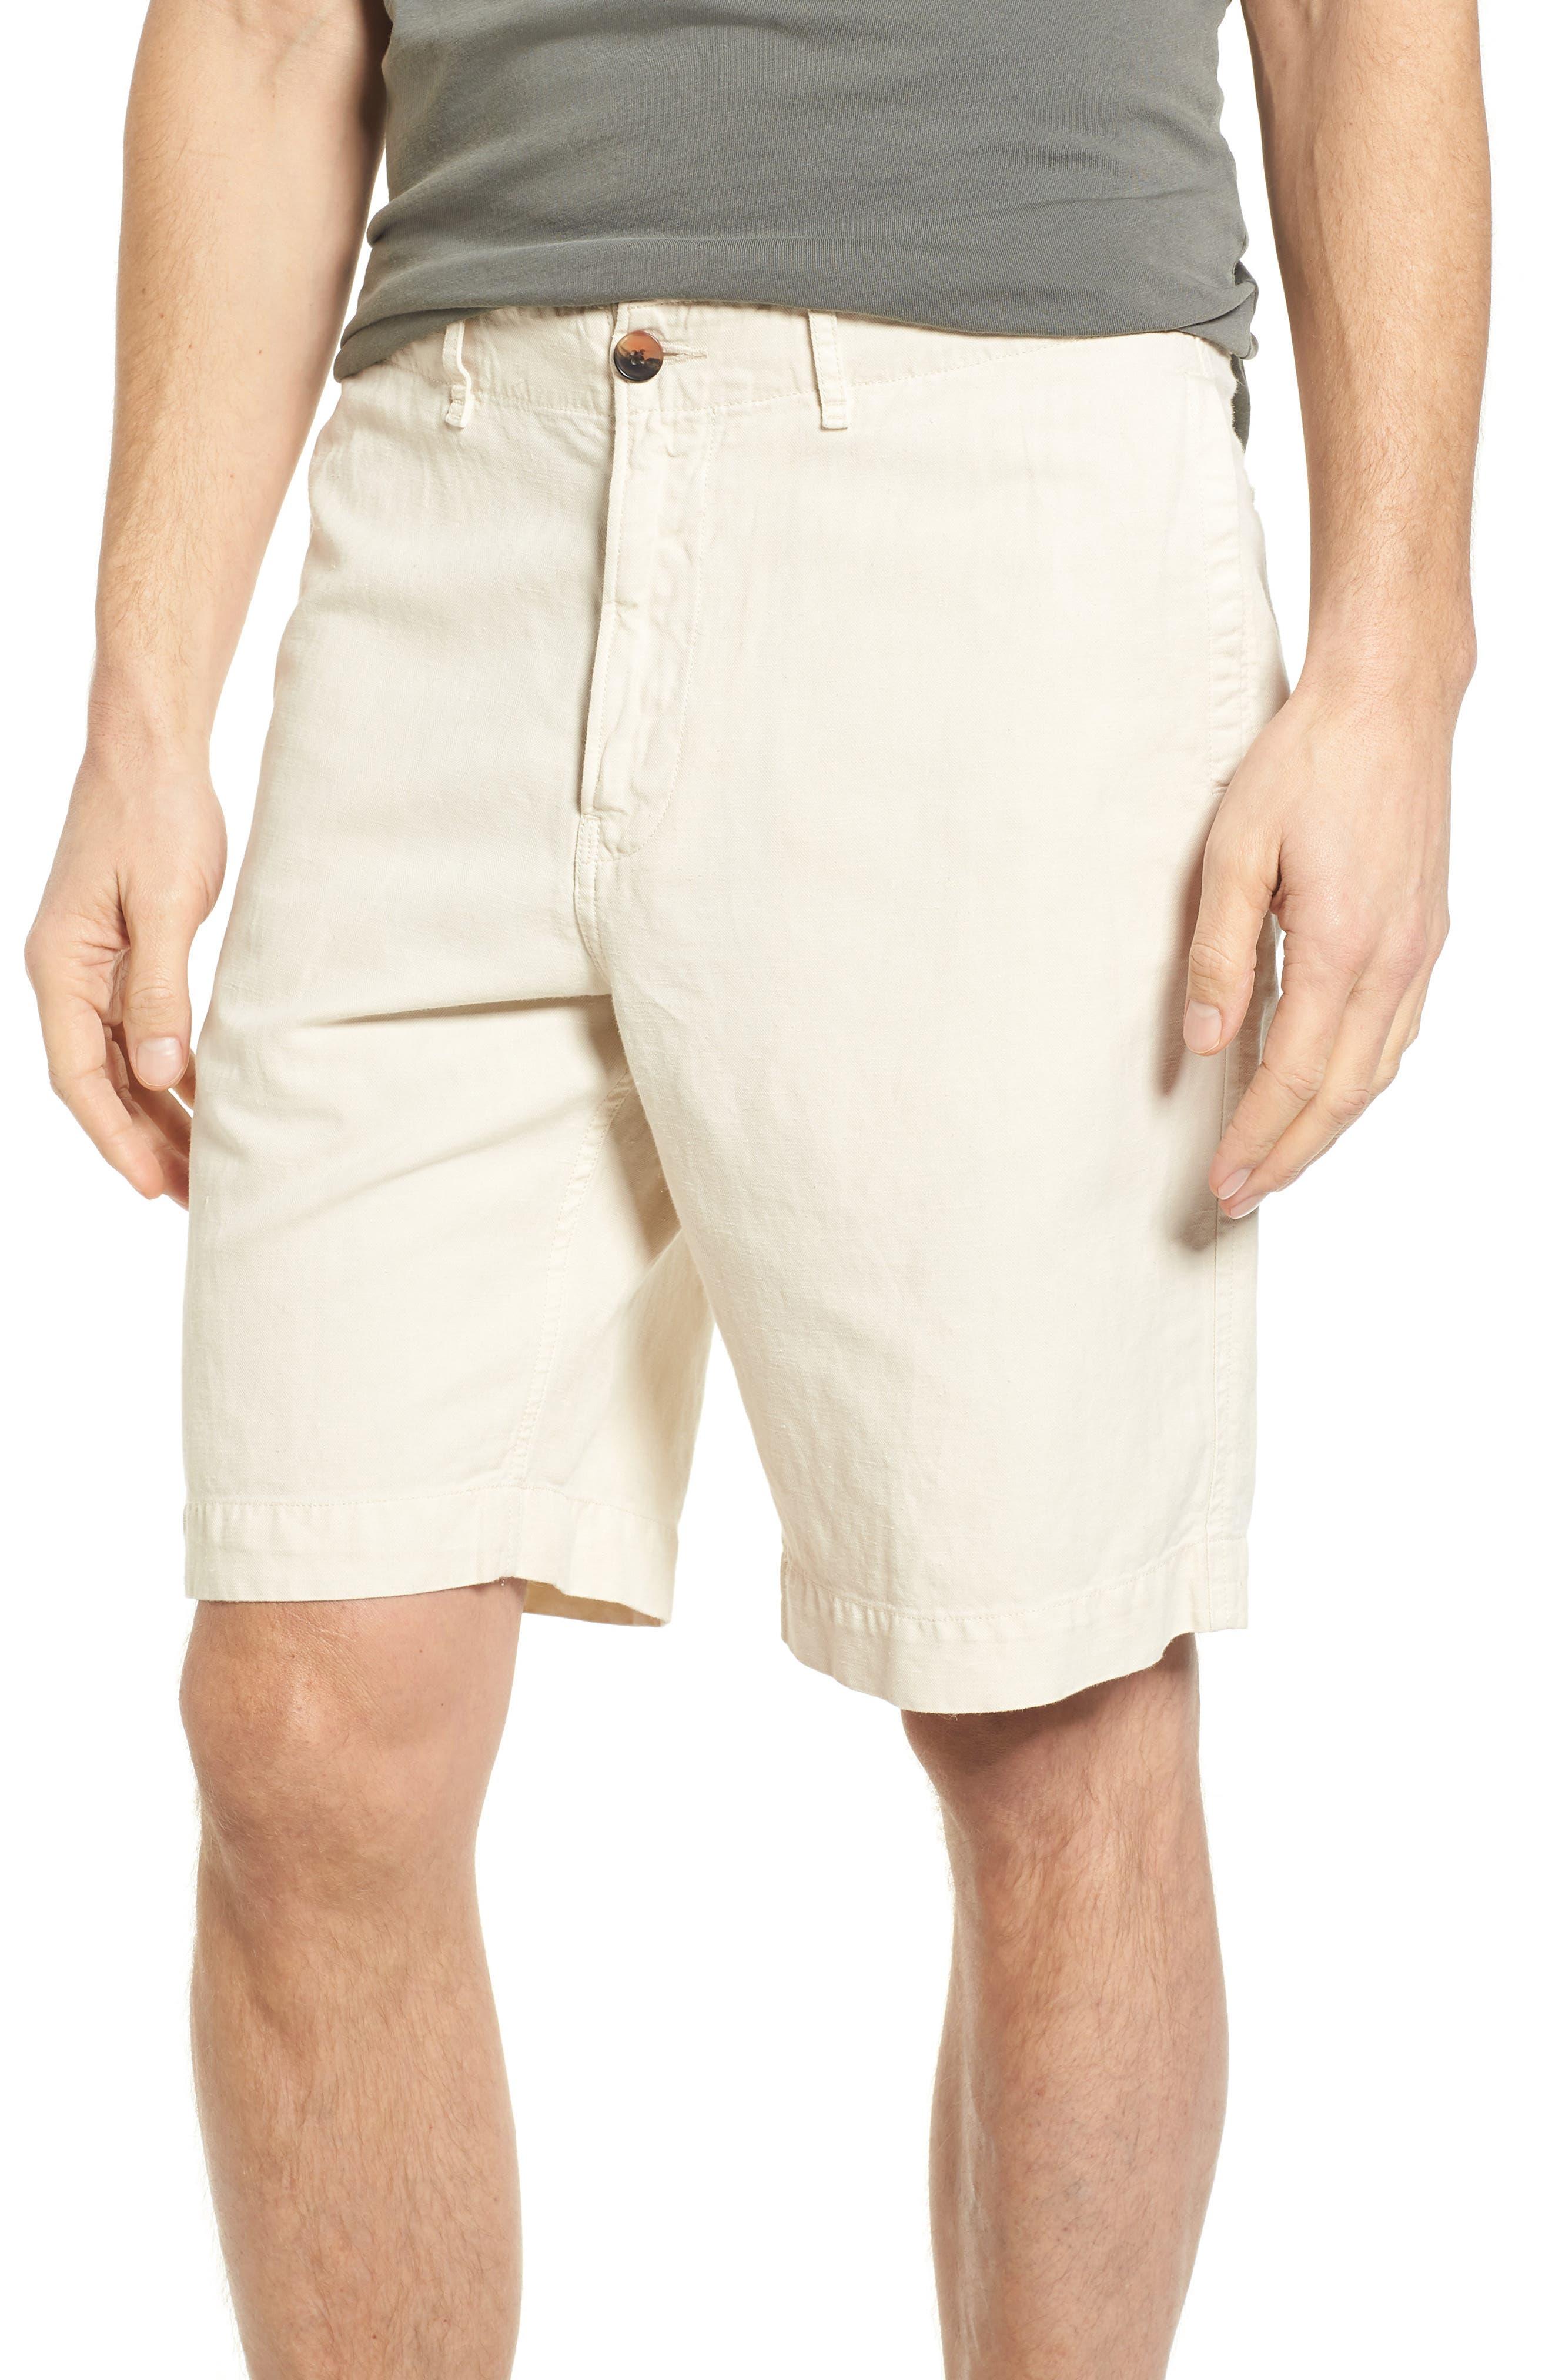 Clyde Cotton & Linen Shorts,                             Main thumbnail 1, color,                             EGGSHELL